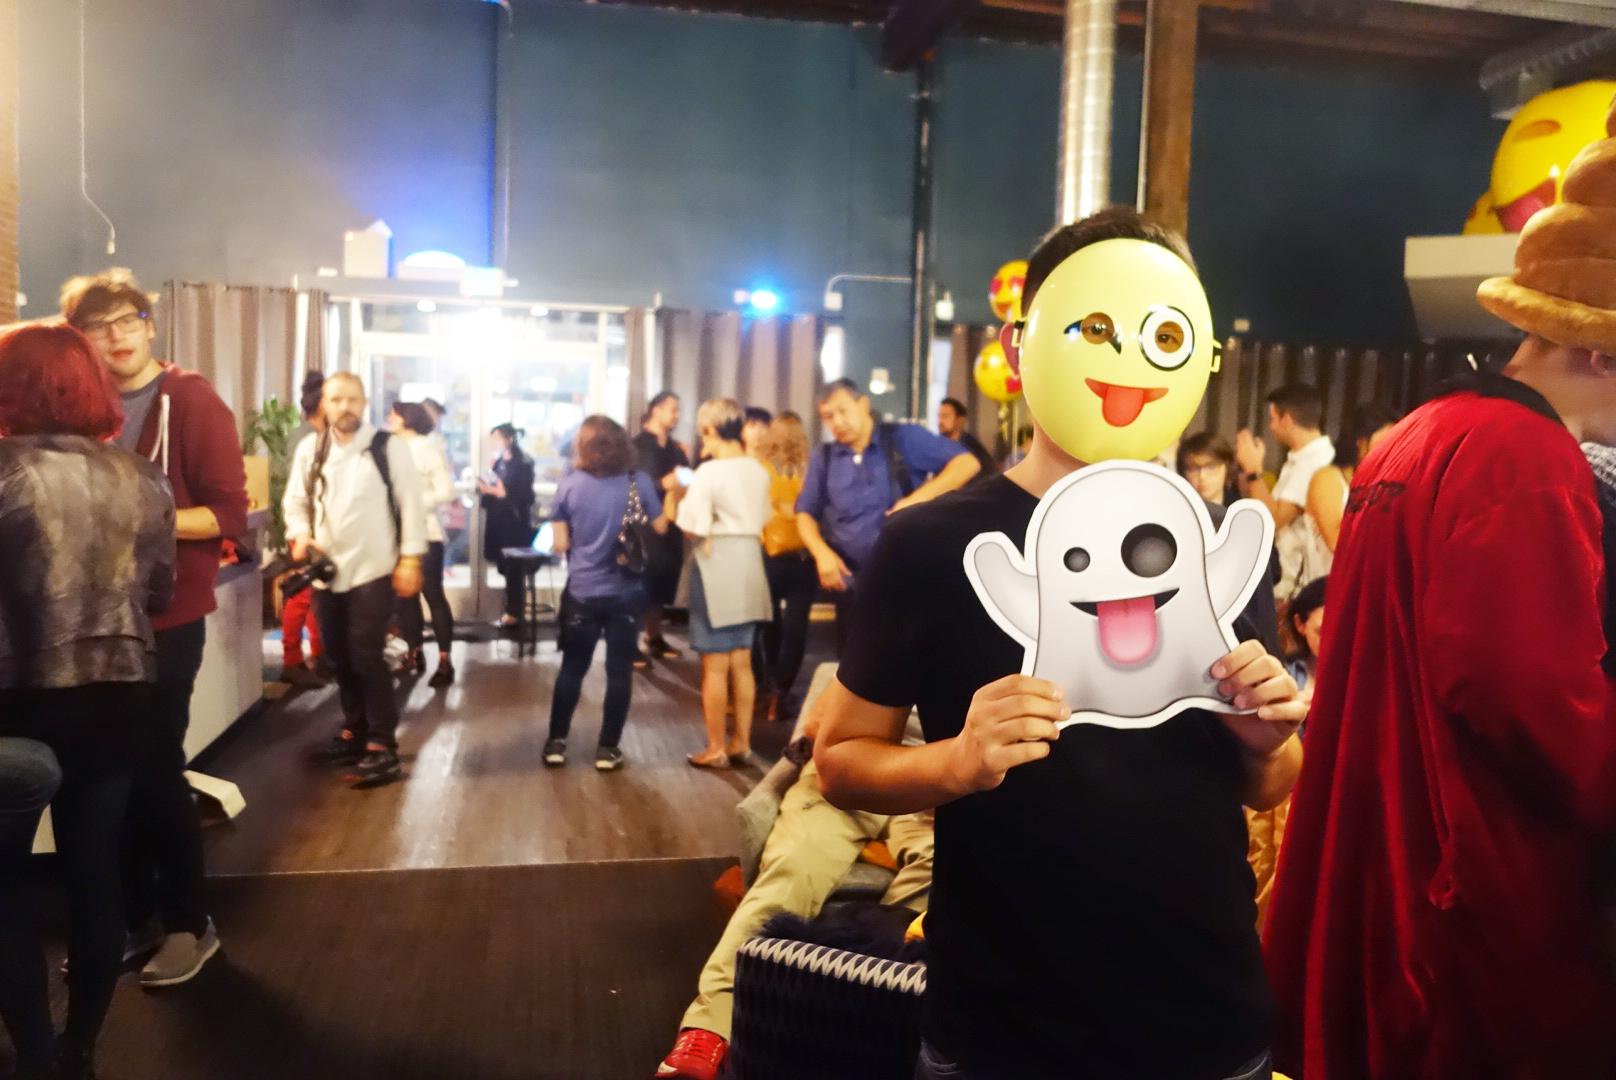 The first emoji convention, Emojicon, held in San Francisco, CA on Nov. 4 through Nov. 6, 2016.